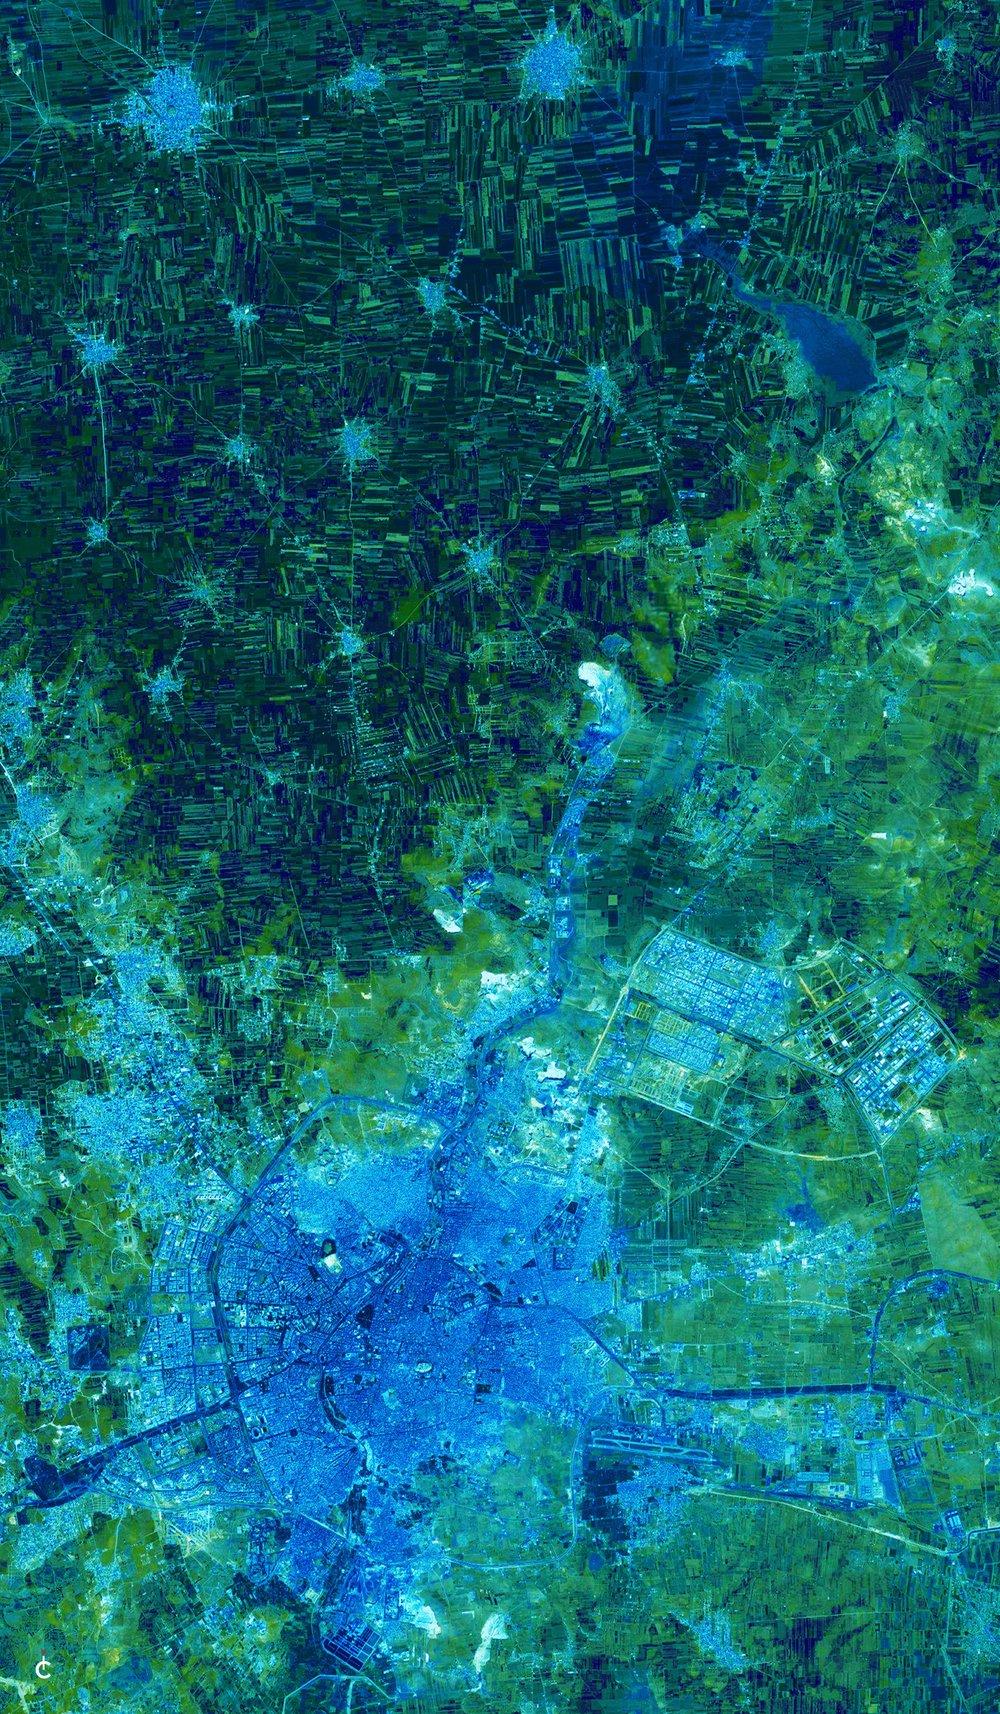 aleppo final colored blue FINAL small.jpg